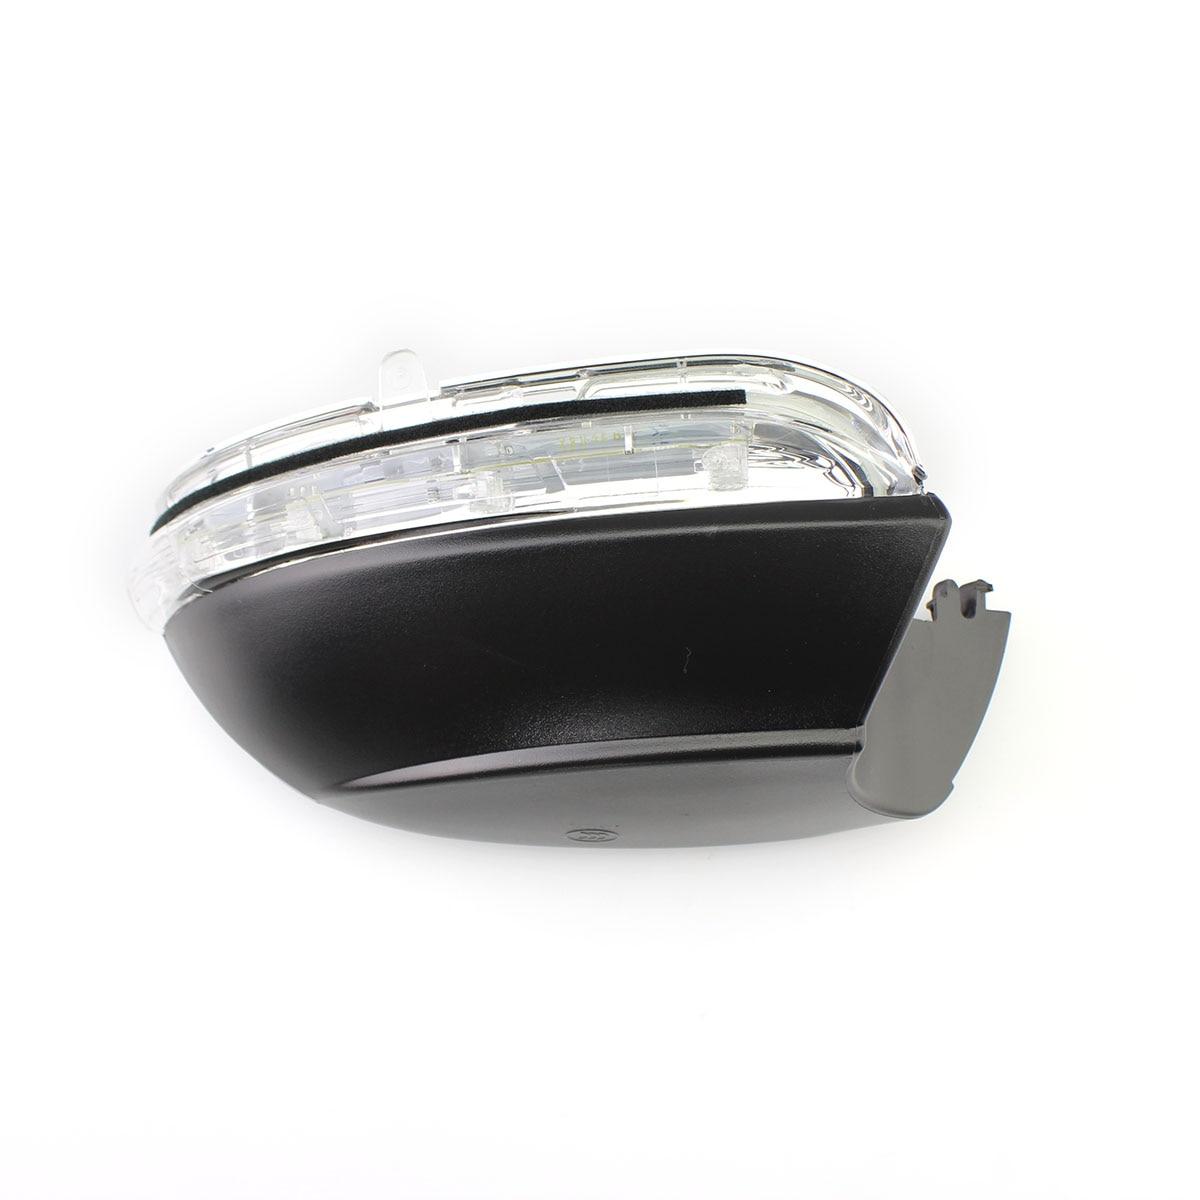 Lámpara de luz OEM para señal de giro de espejo retrovisor ajuste Passat B7 Jetta MK6 Beetle 12-15 16D 949 102